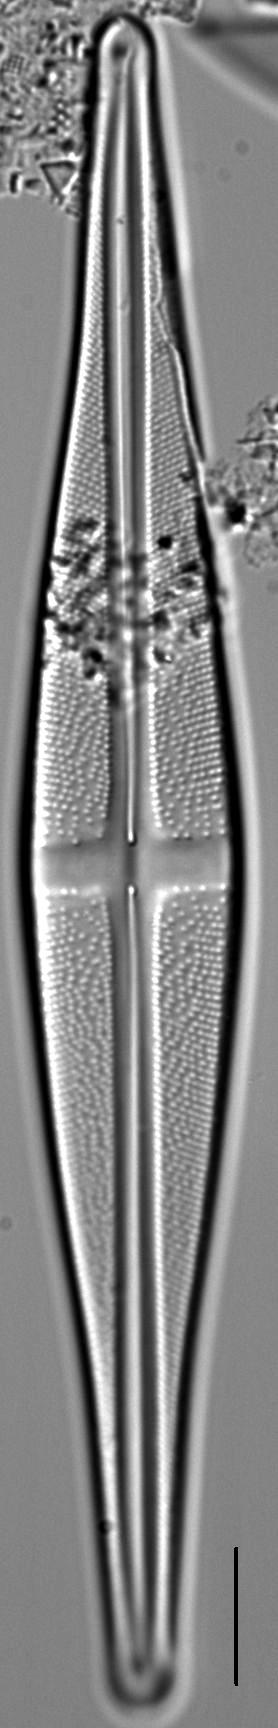 Stauroneis baconiana LM2